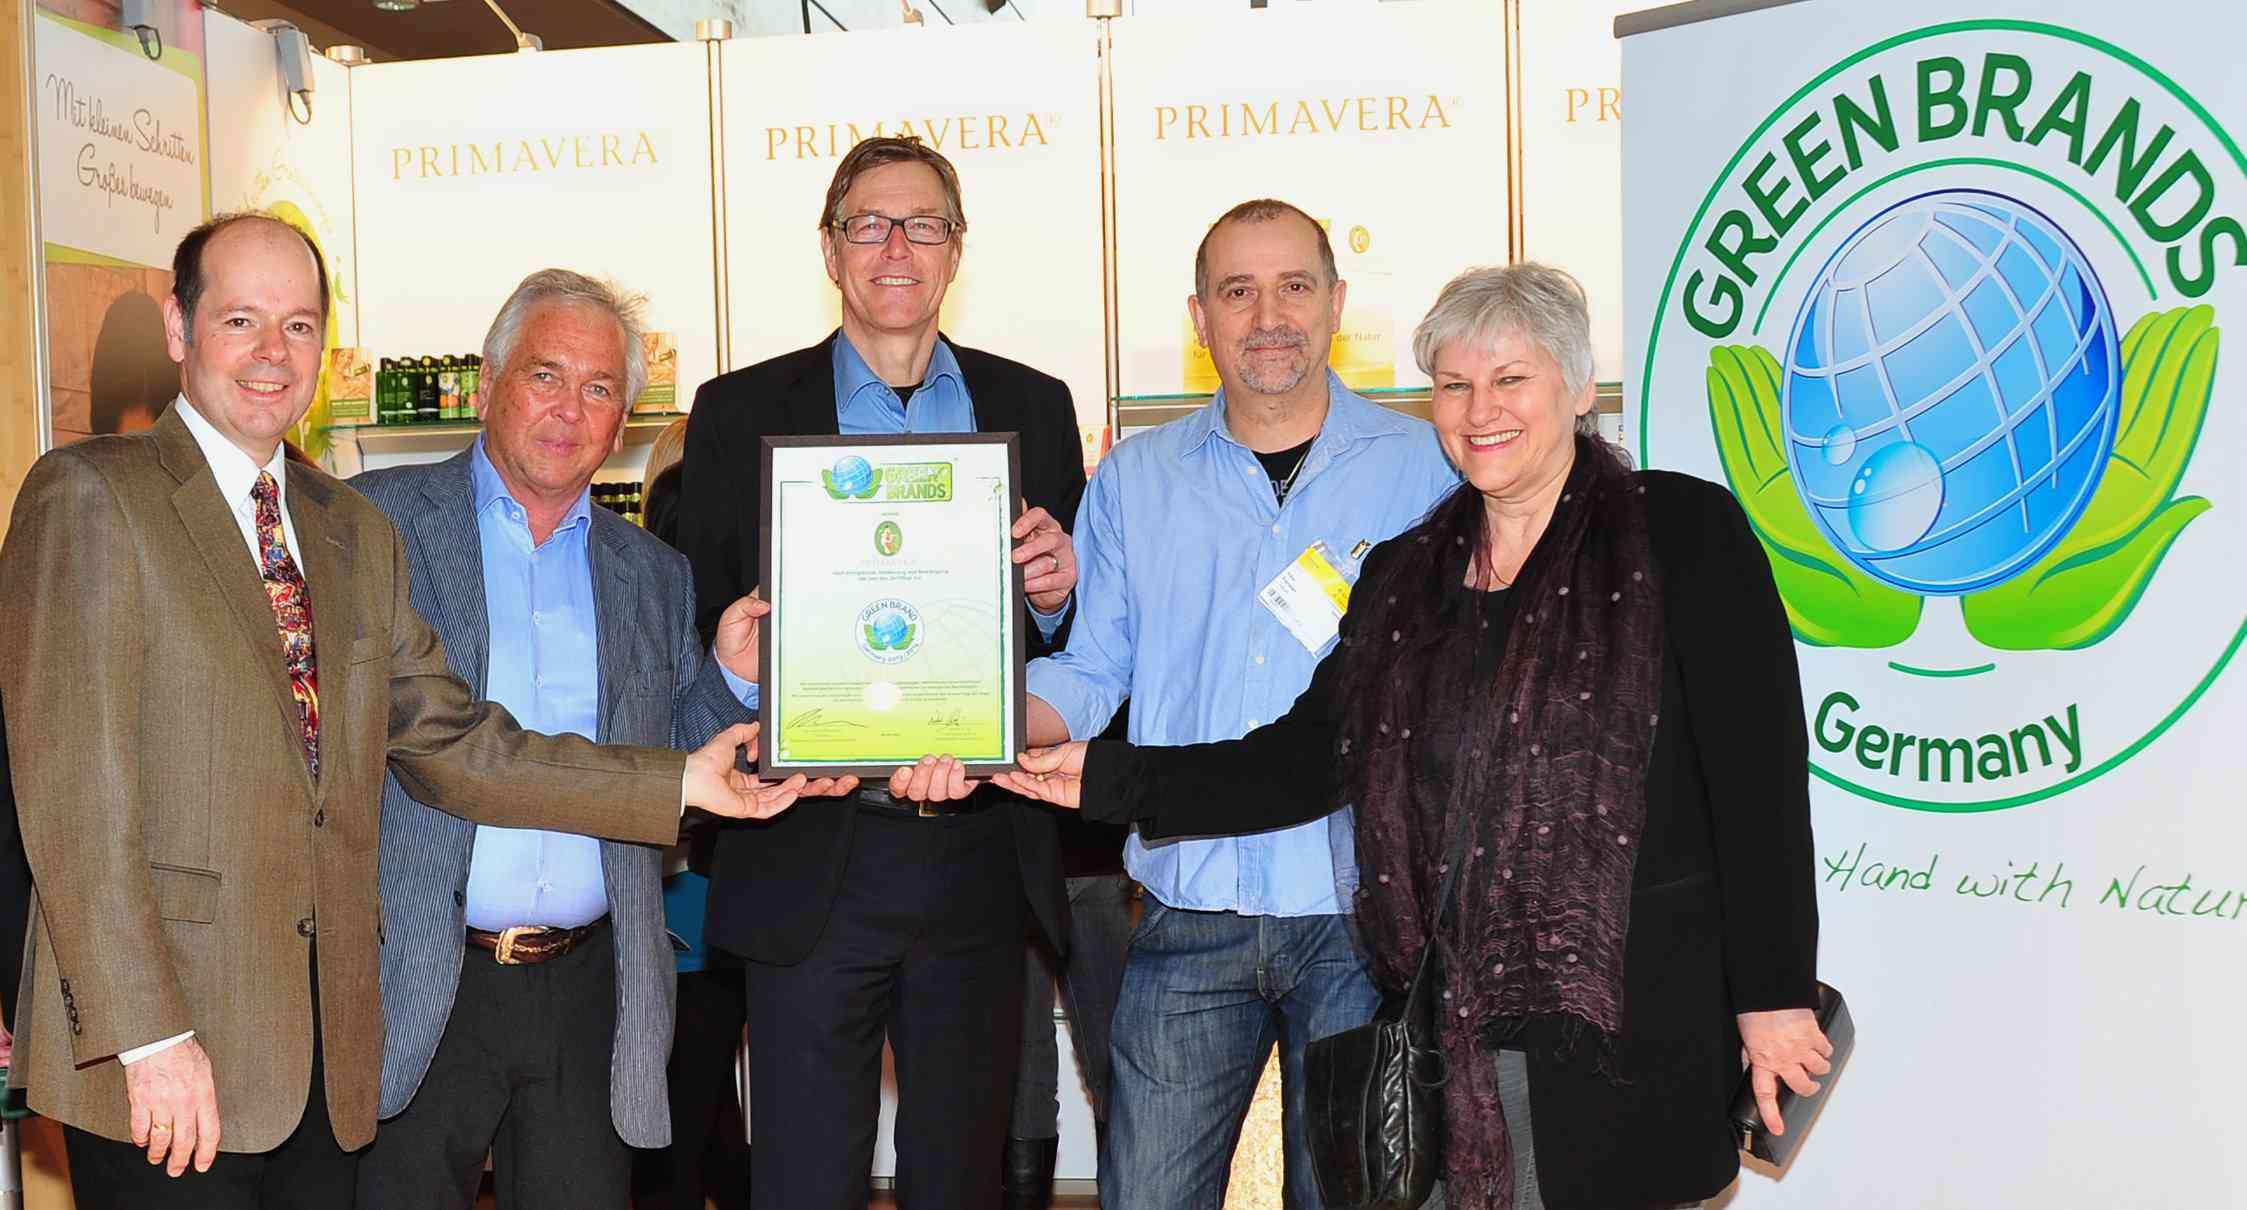 GREEN BRANDS Verleihung Primavera Februar 2013